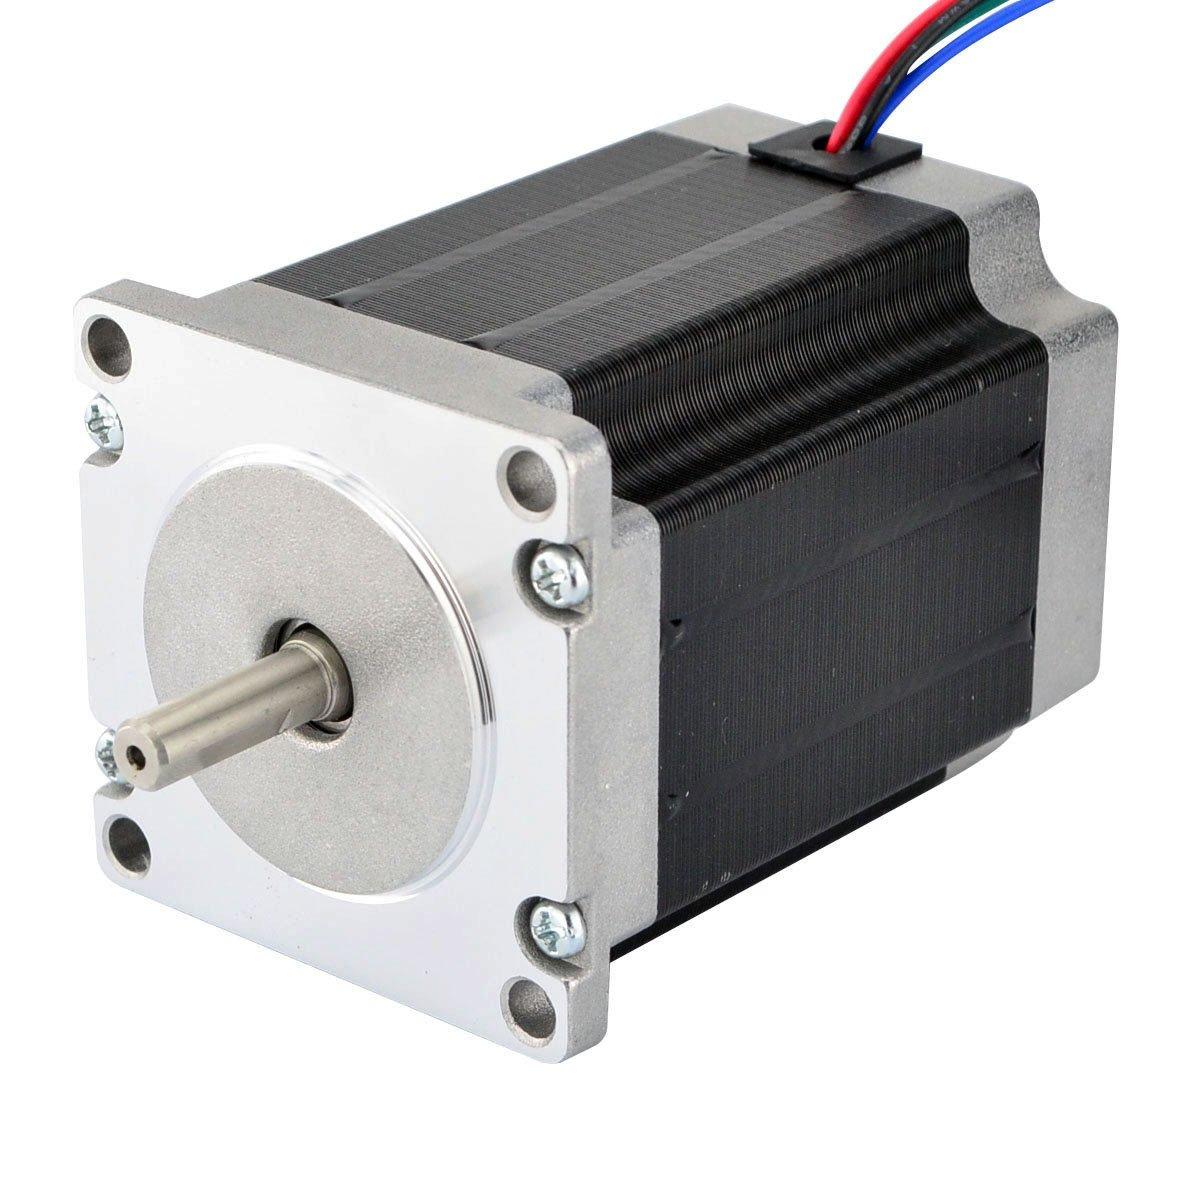 CNC Stepper Motor Nema 23 Bipolar 2.8A 269oz.in/1.9Nm CNC Mill Lathe Router